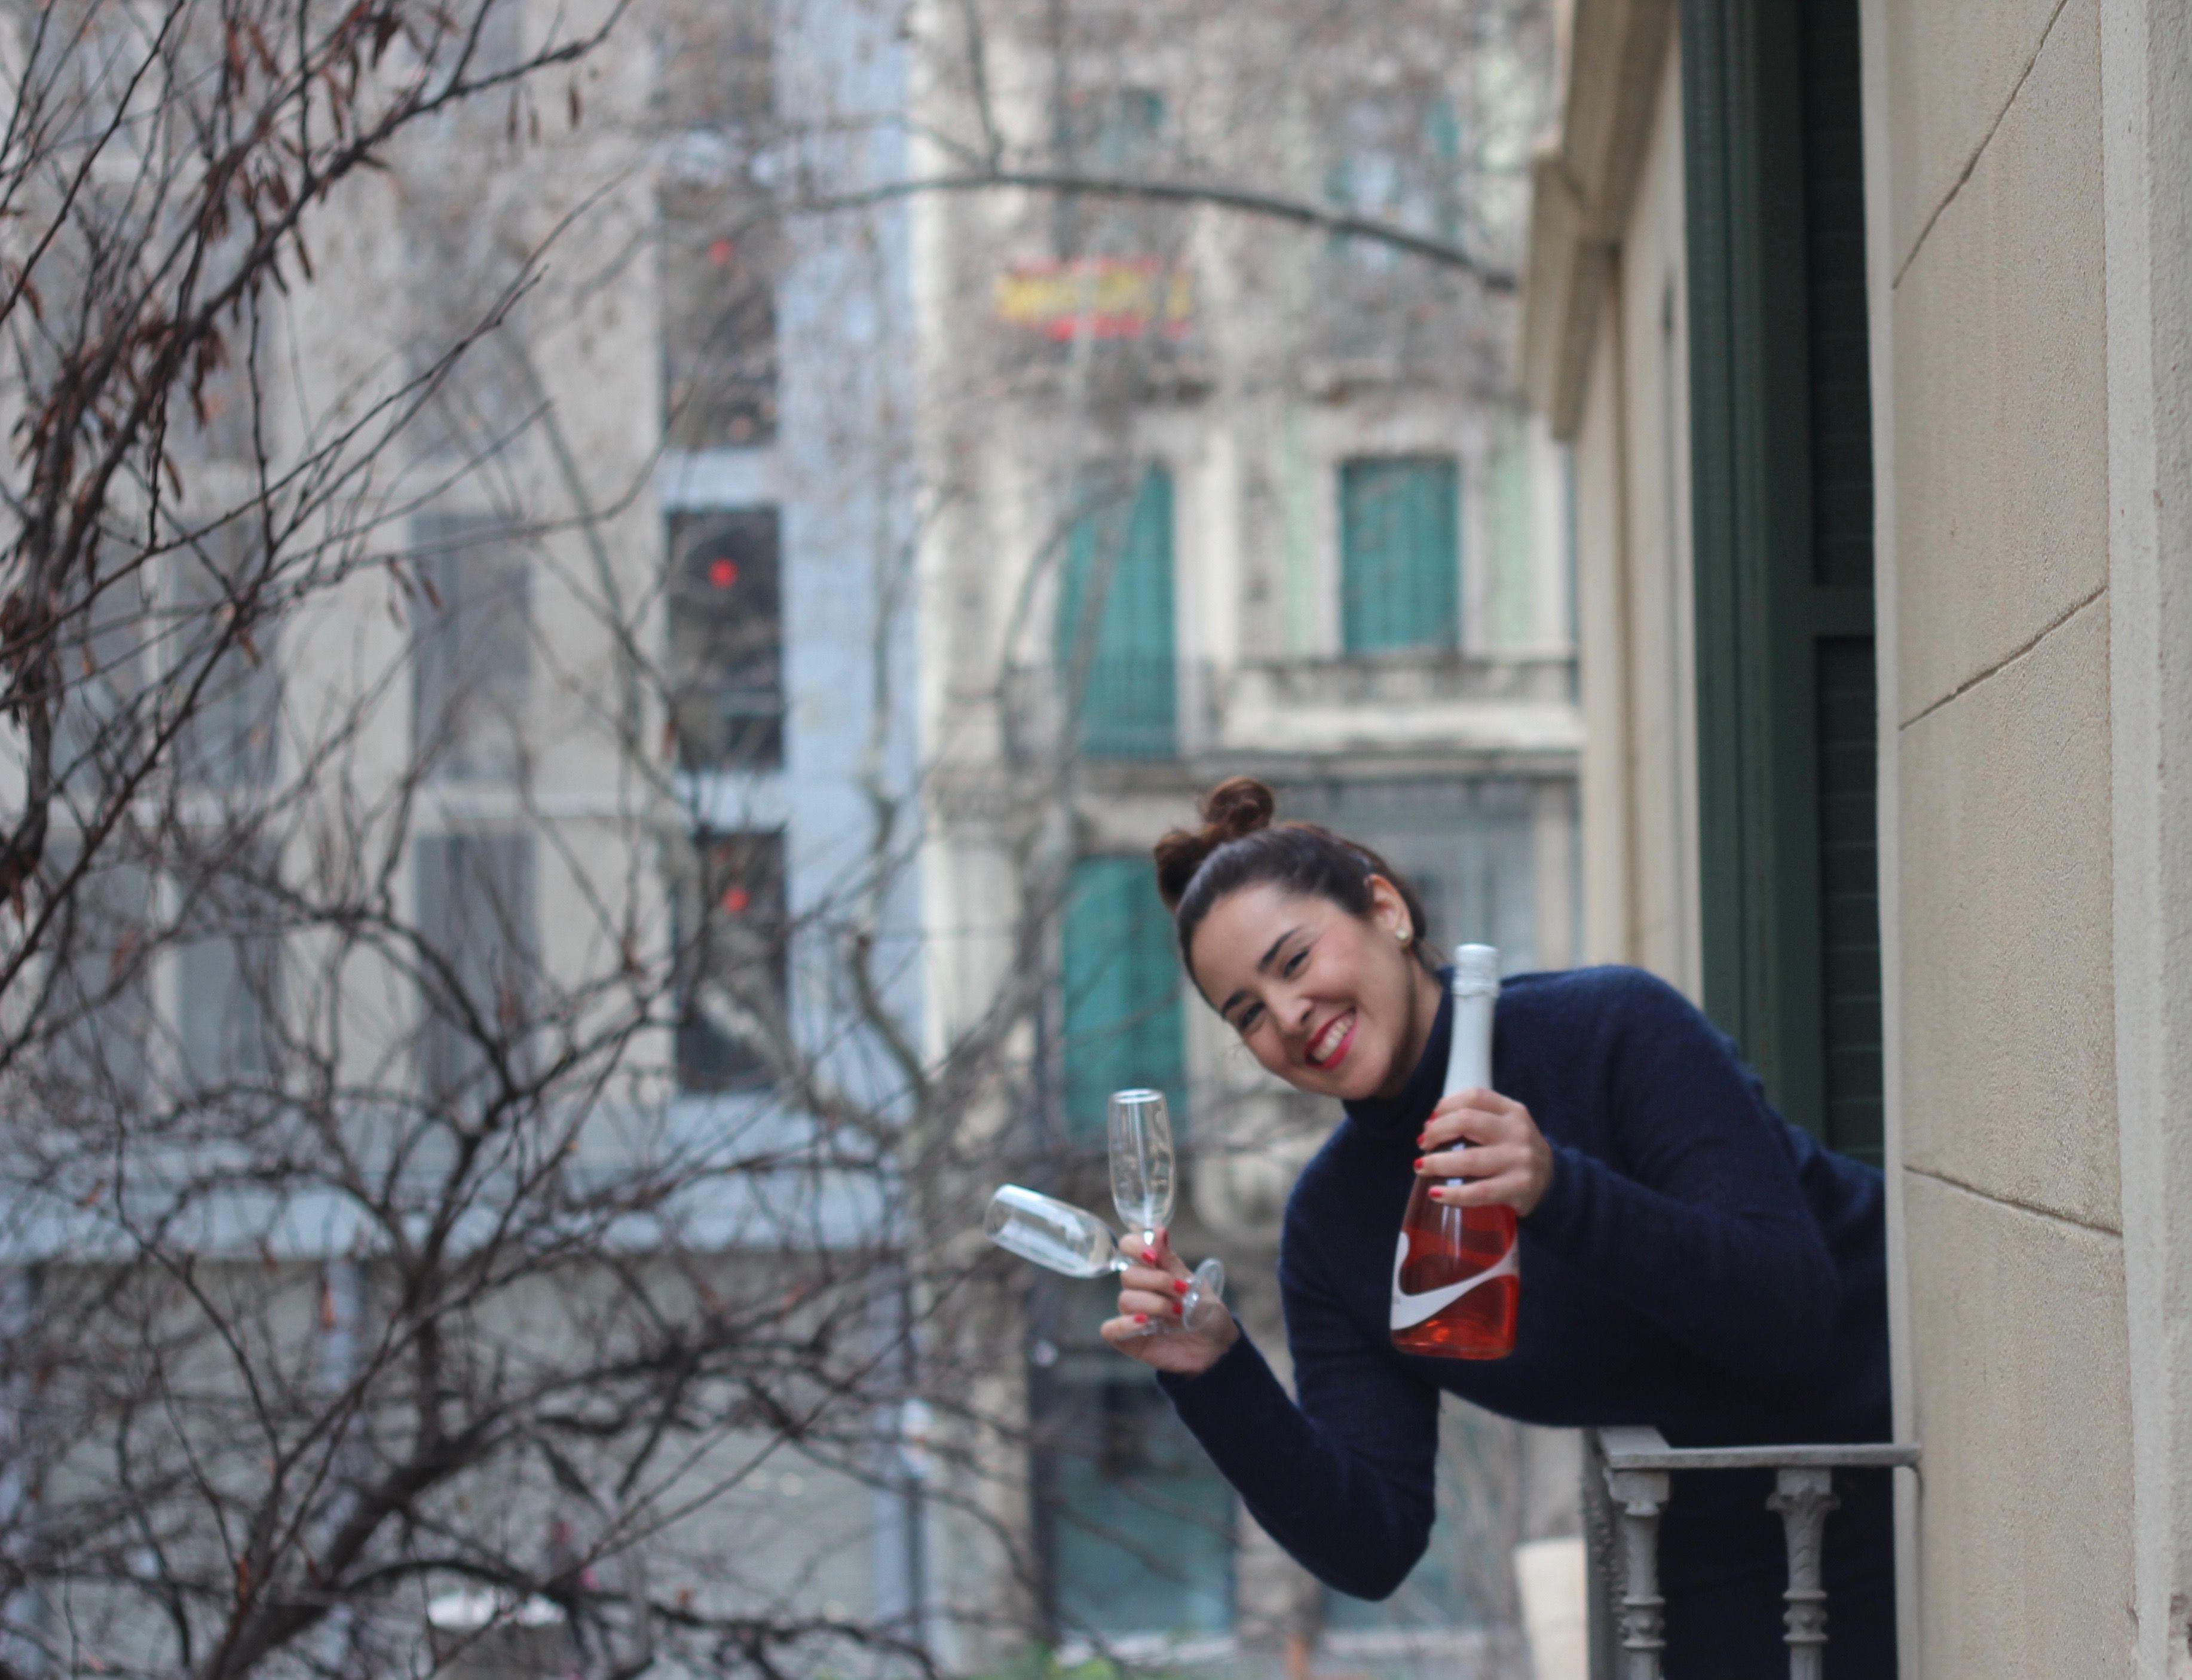 dantani drinks coctel de cava